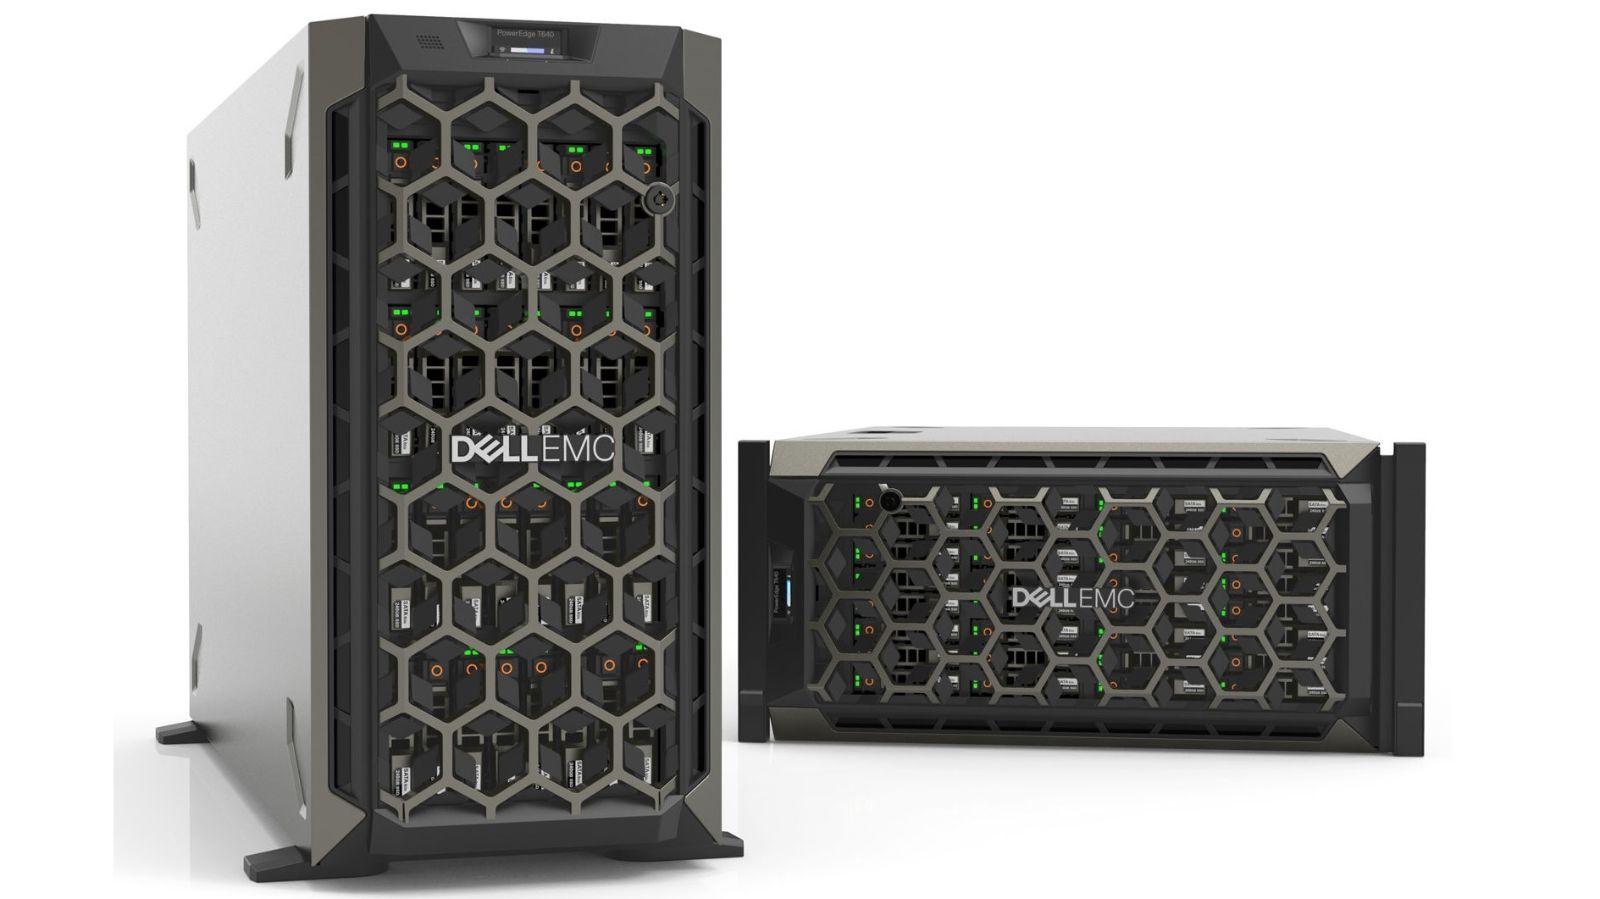 SLN310171_en_US__213enterprise-servers-poweredge-t640